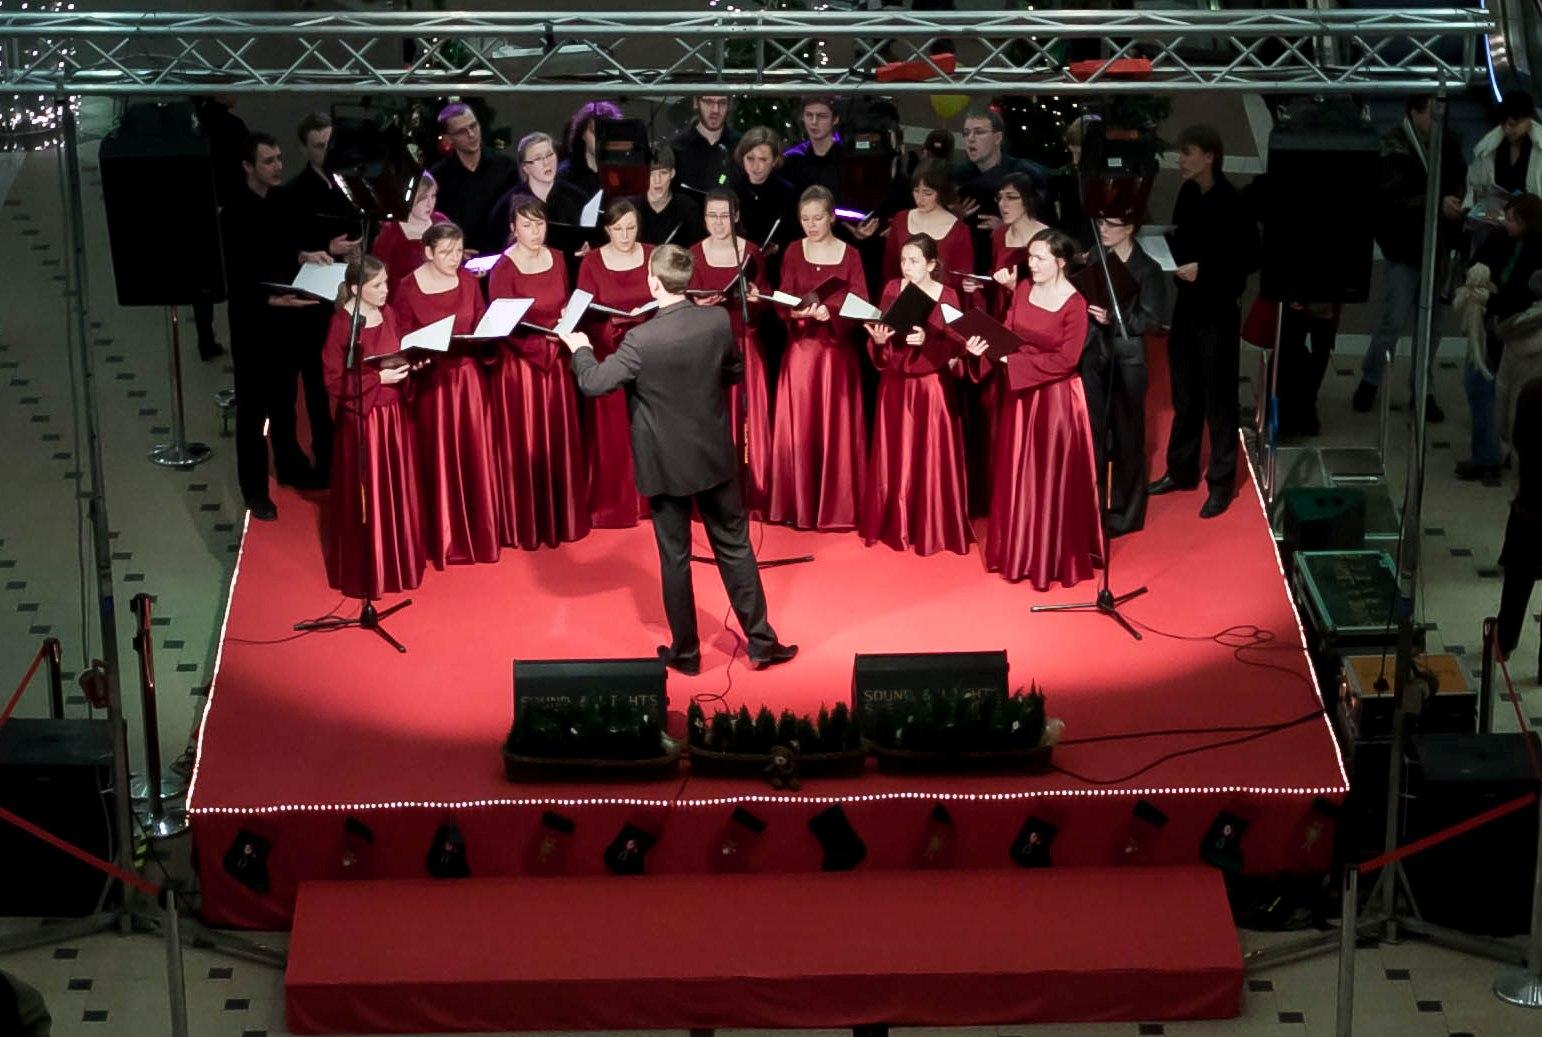 koncert-koled-w-galerii-pestka2-grudzien-2010